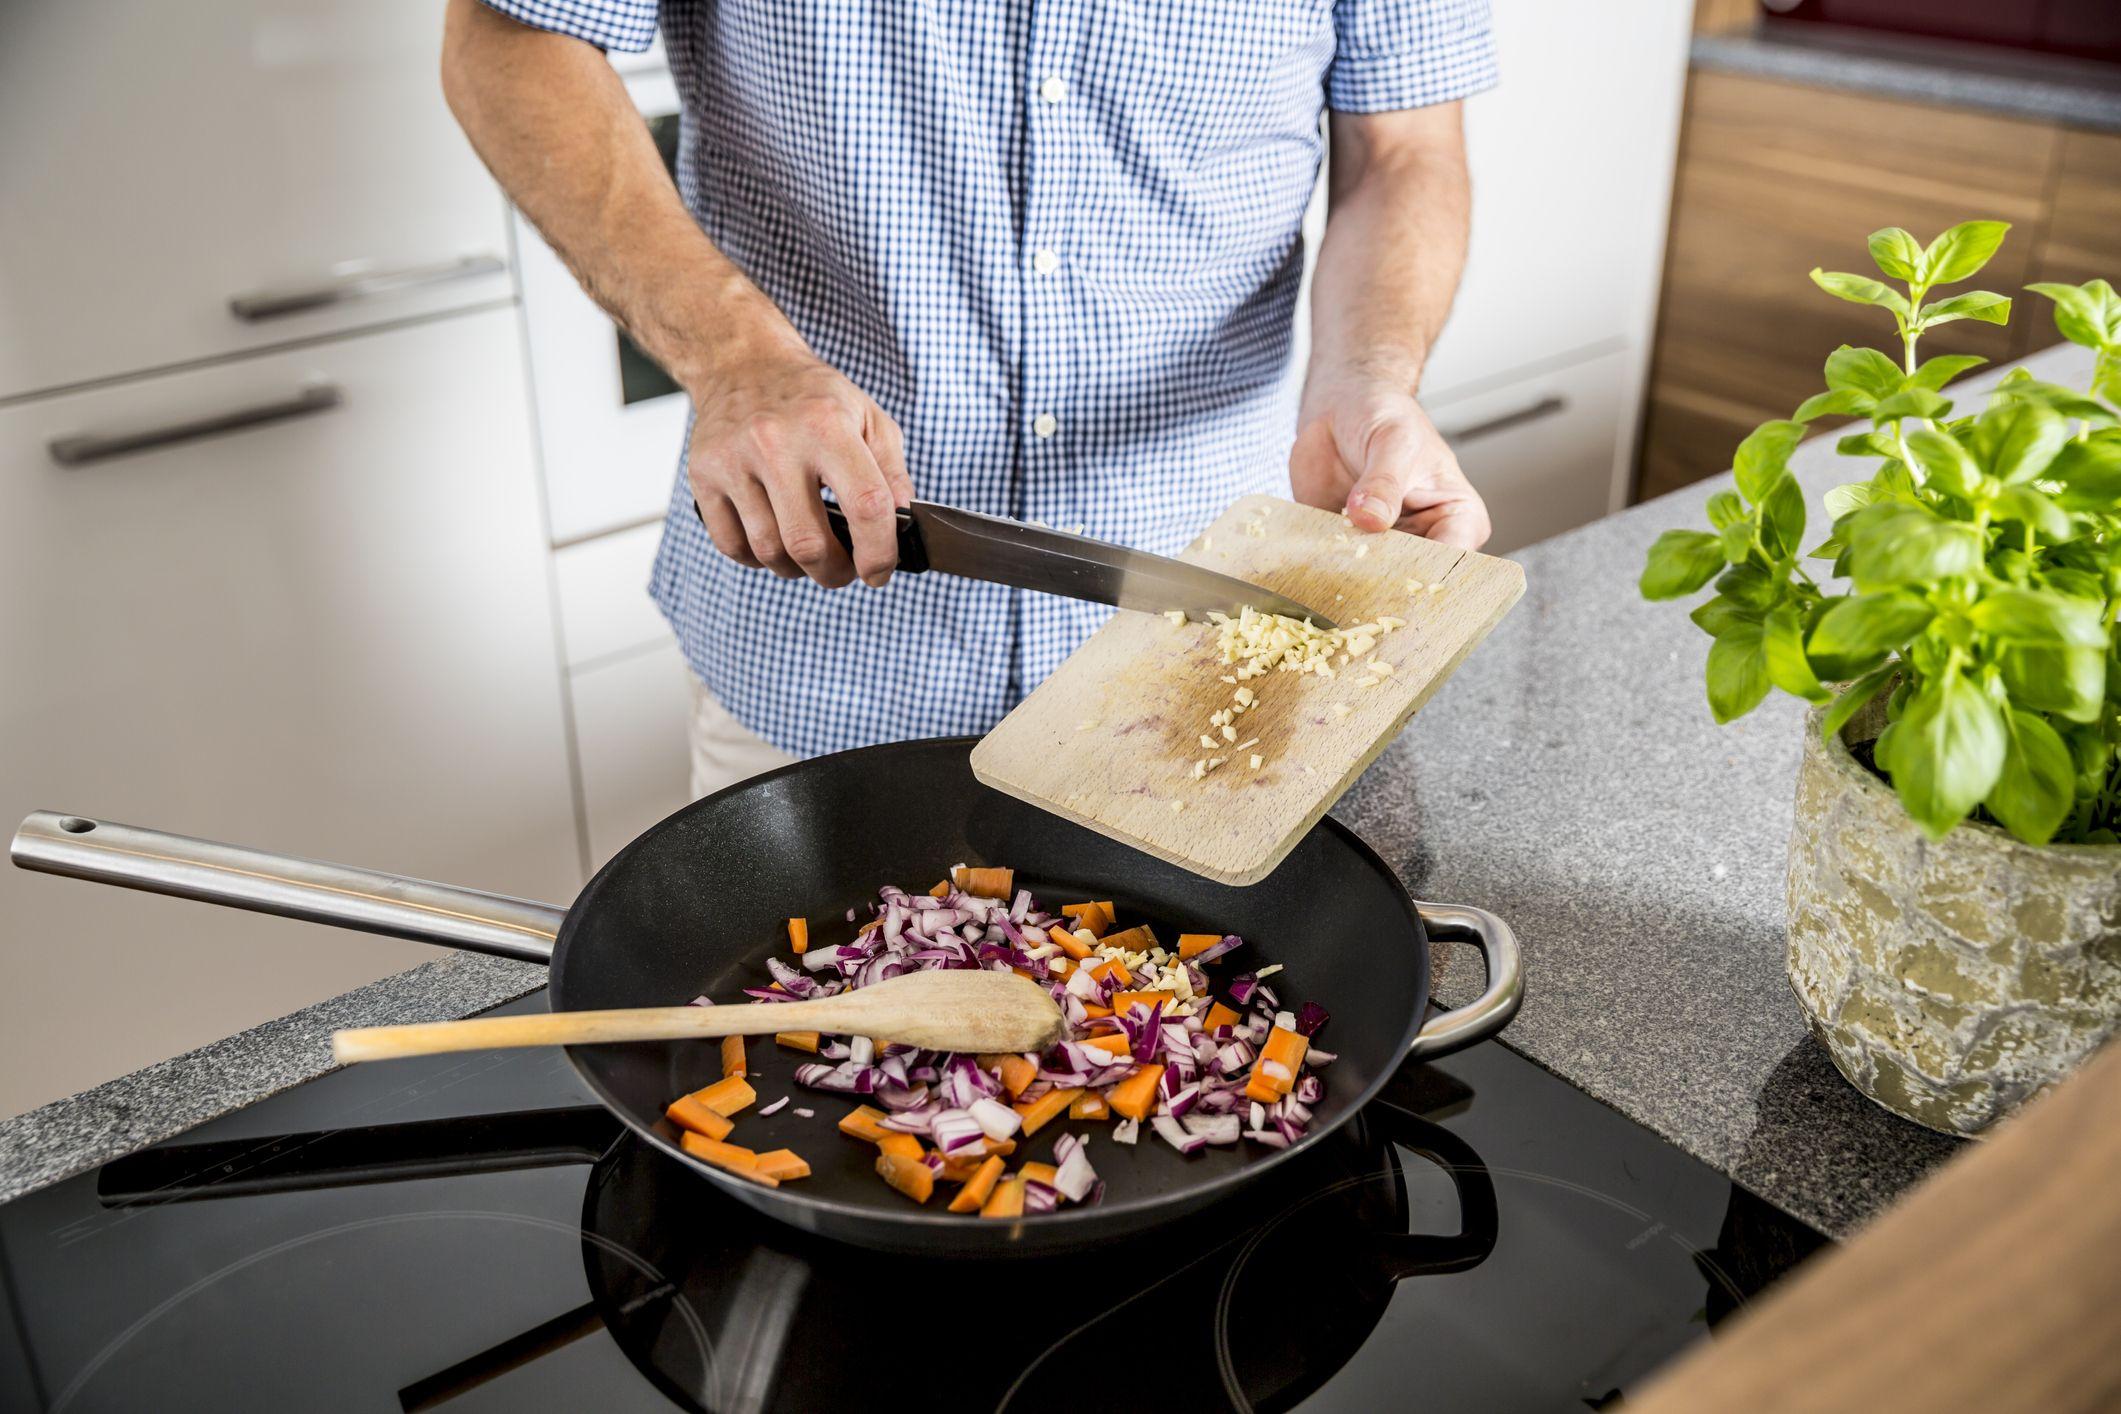 8 Best Nonstick Cookware for Healthy Cooking